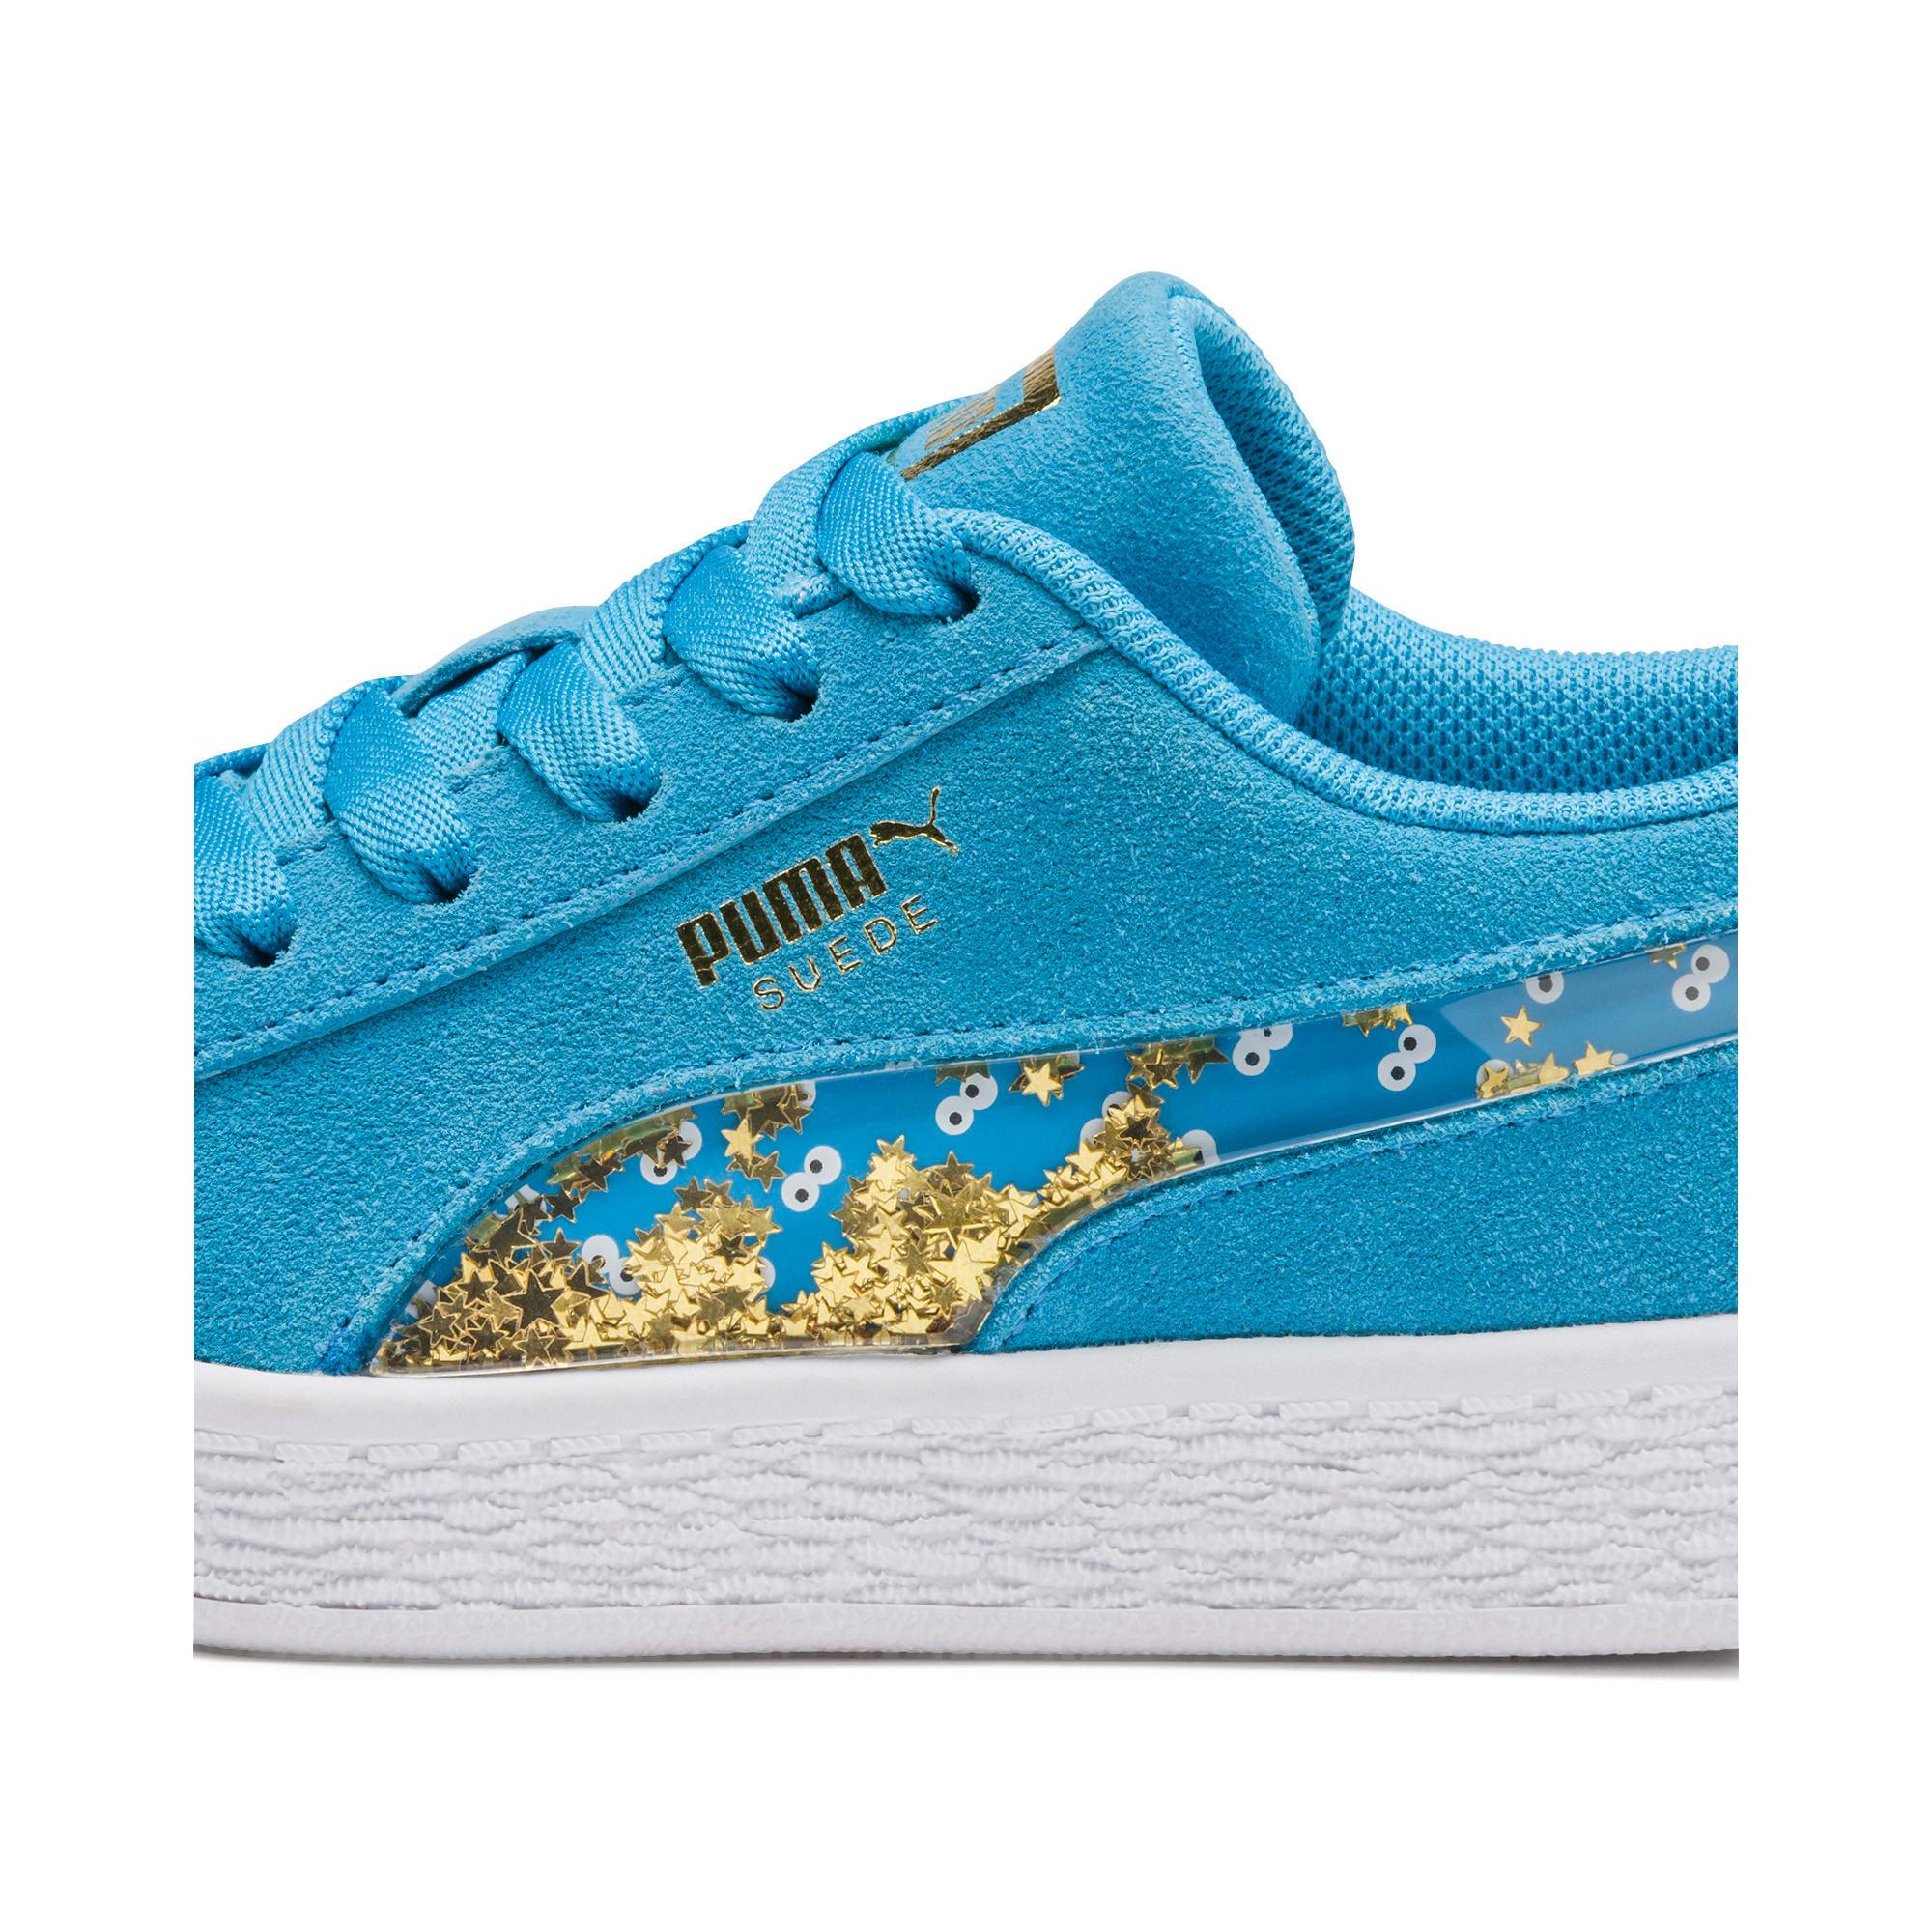 Thumbnail 8 of PUMA x SESAME STREET 50 Suede Statement Sneakers JR, Bleu Azur-Puma White, medium